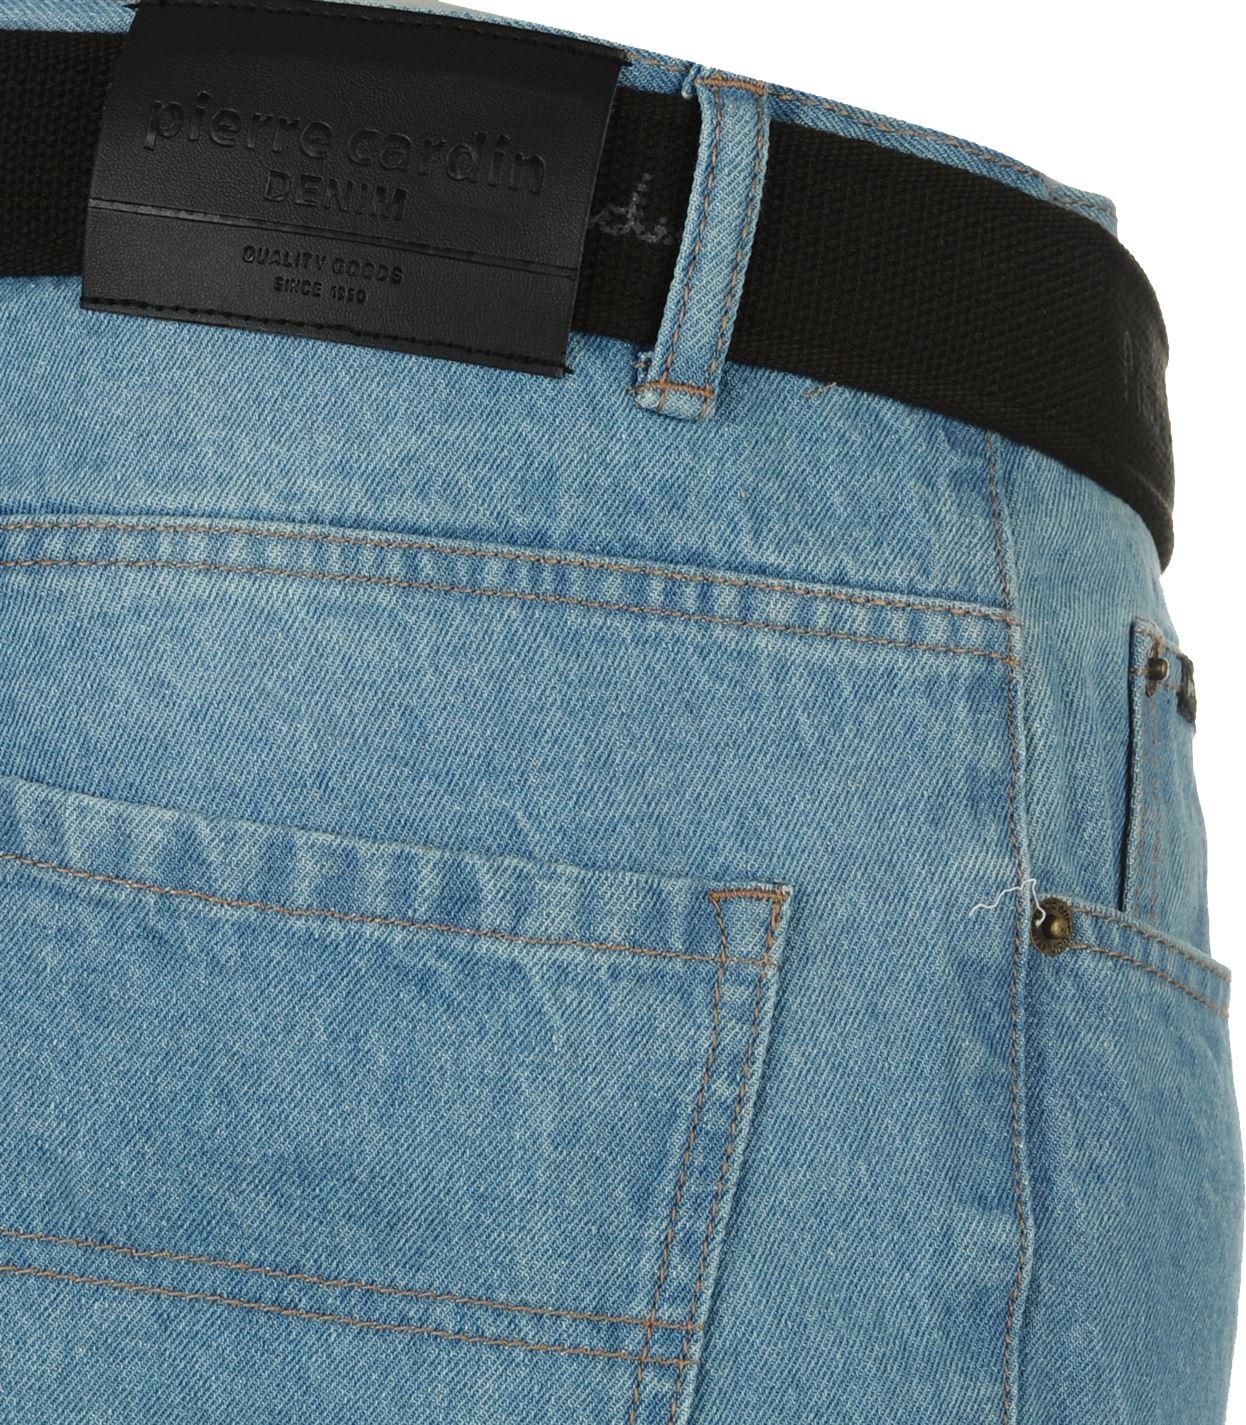 Mens-Belted-Denim-Jeans-Straight-Leg-Regular-Fit-Pierre-Cardin-Pants-Big-Tall thumbnail 13